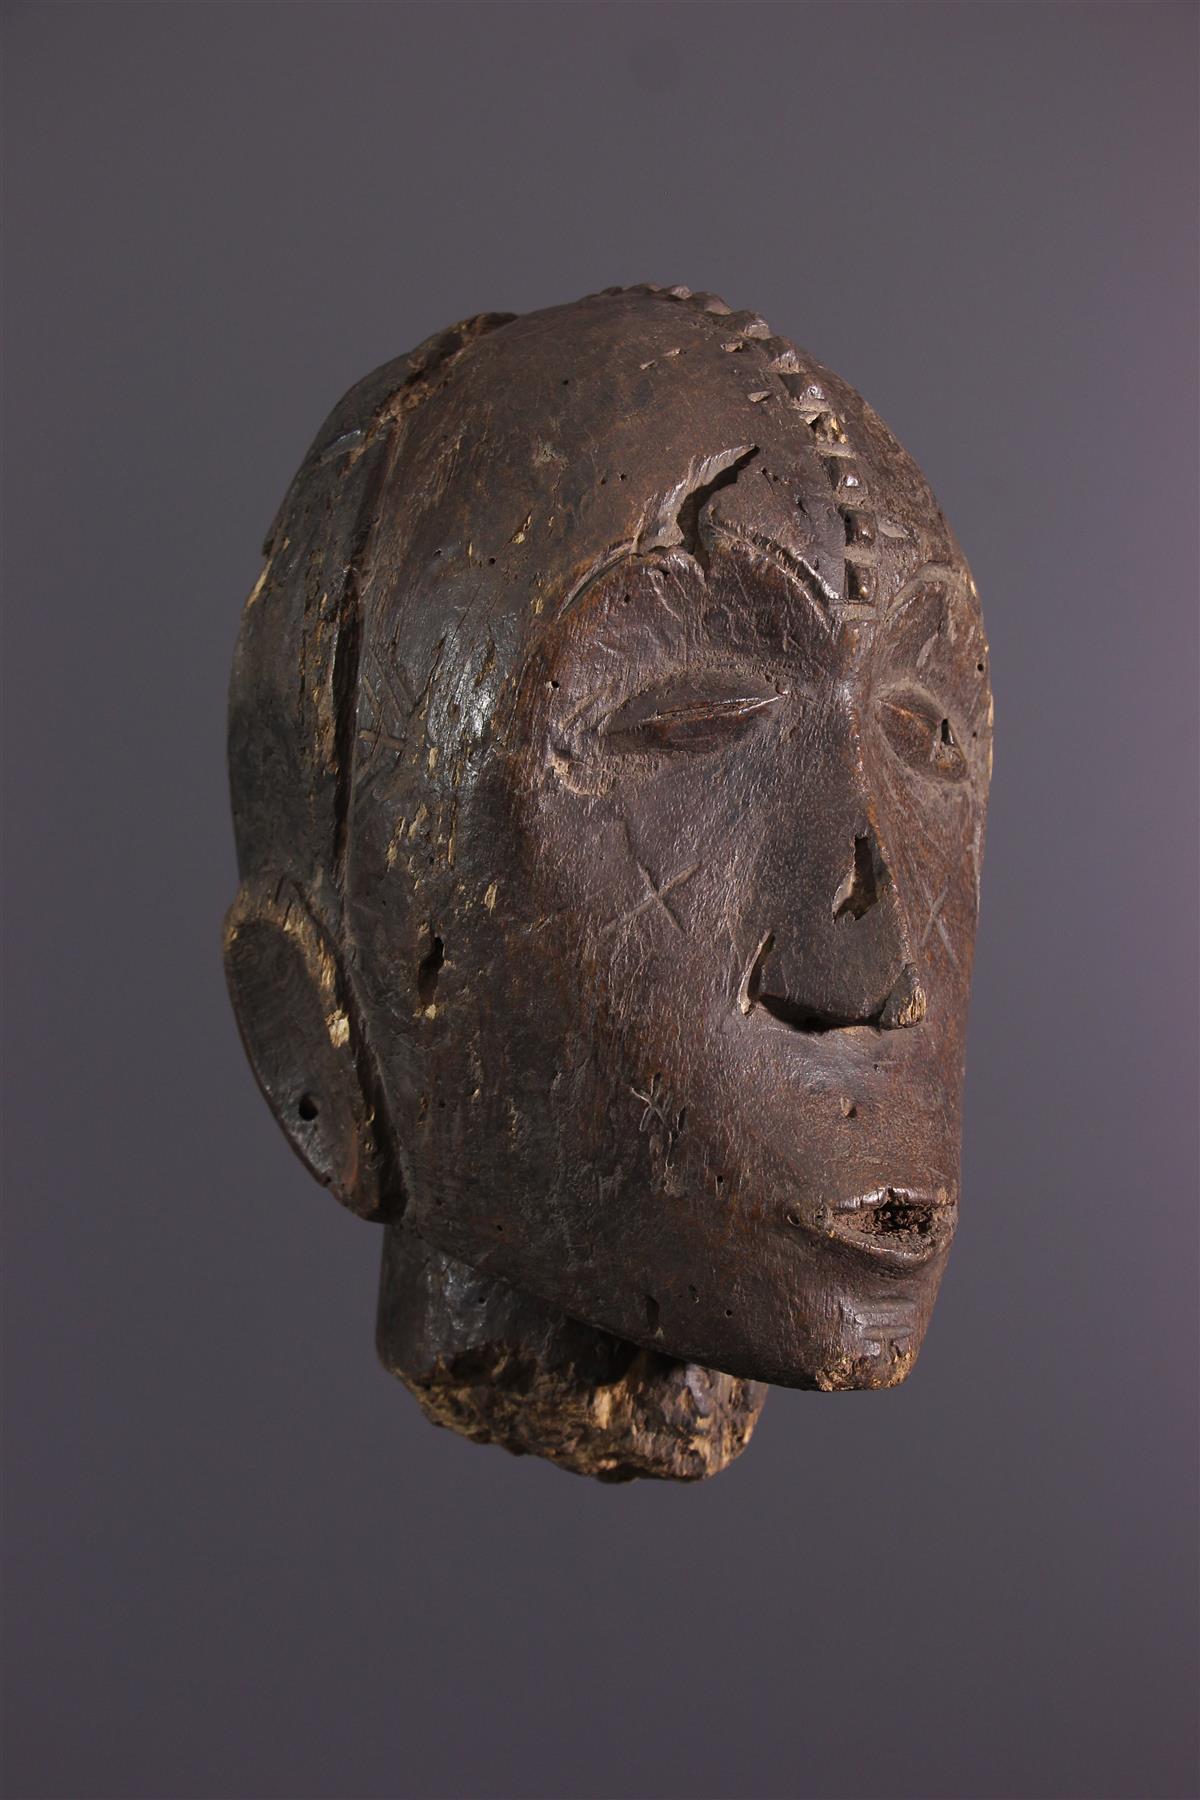 Head Ngbandi - Tribal art